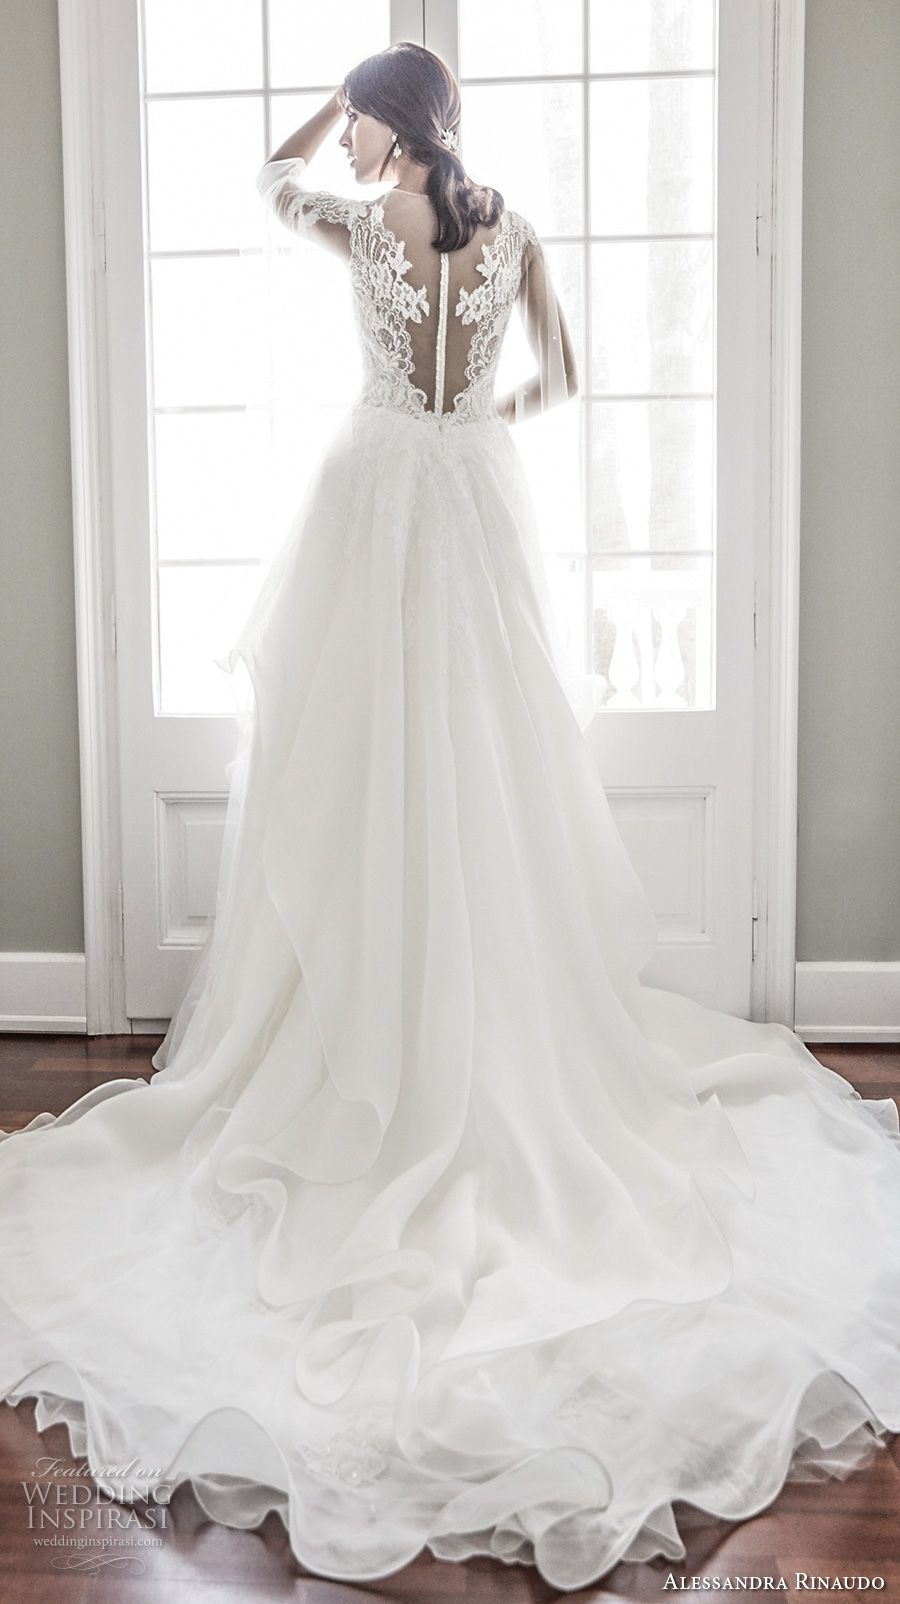 Lace wedding dress with cap sleeves sweetheart neckline  Alessandra Rinaudo  Wedding Dresses  Chapel train Wedding